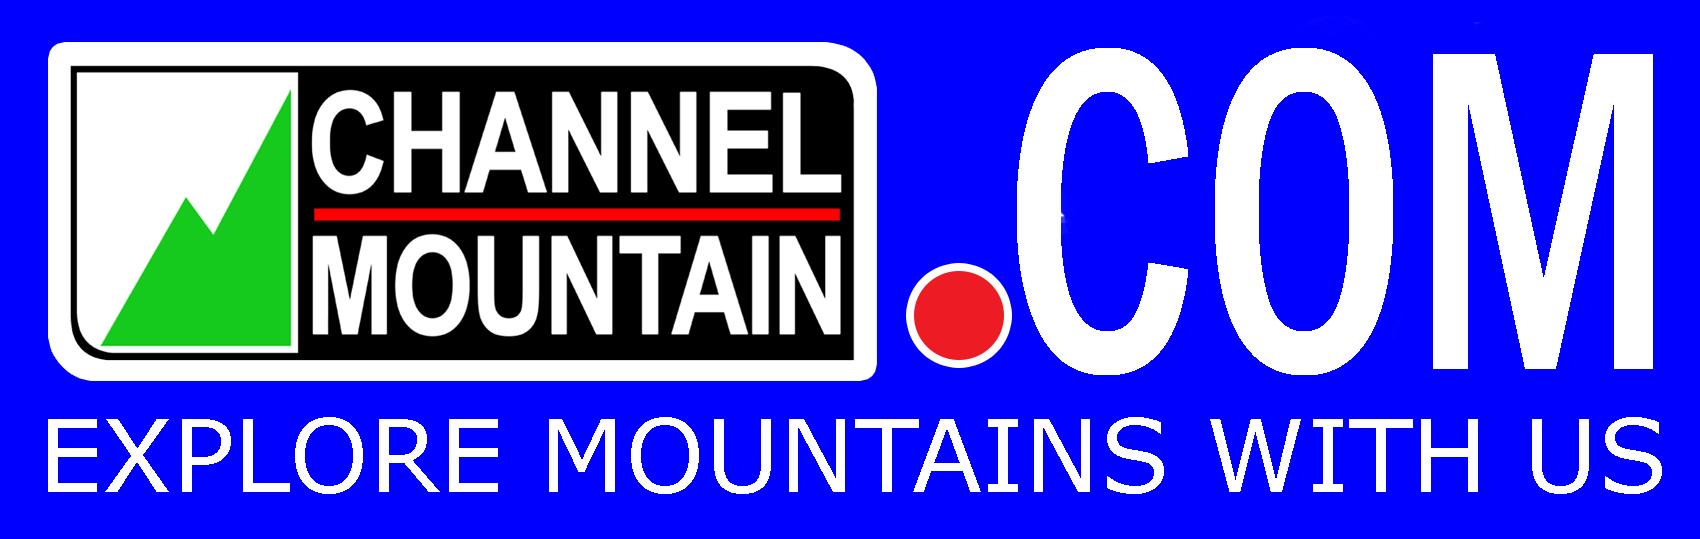 Channel Mountain